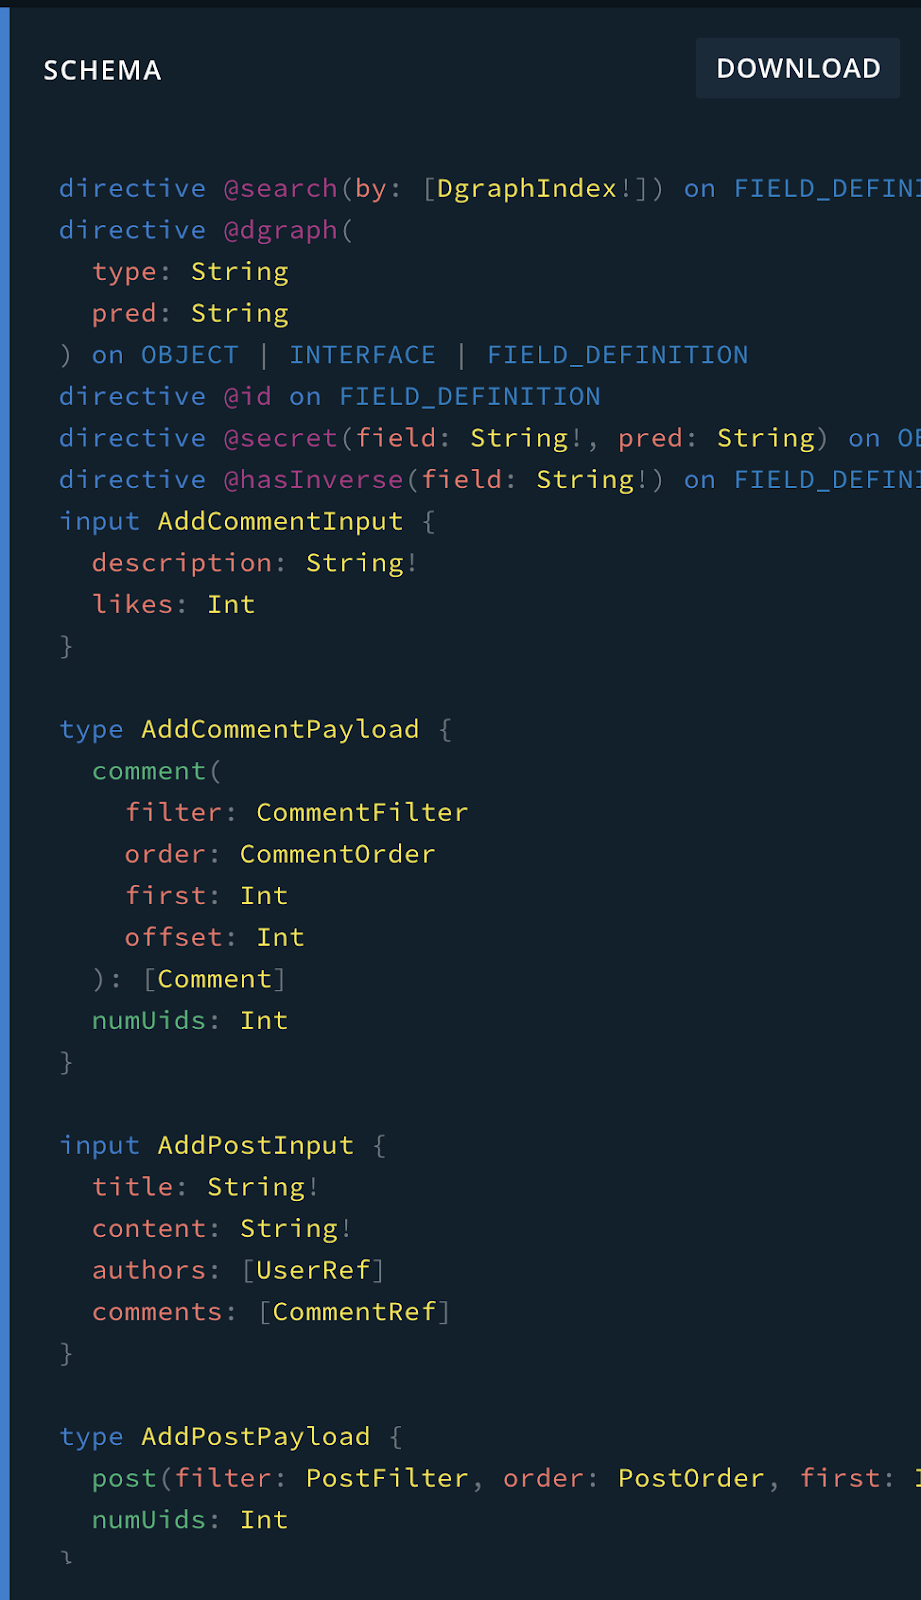 A schema generated in Dgraph.